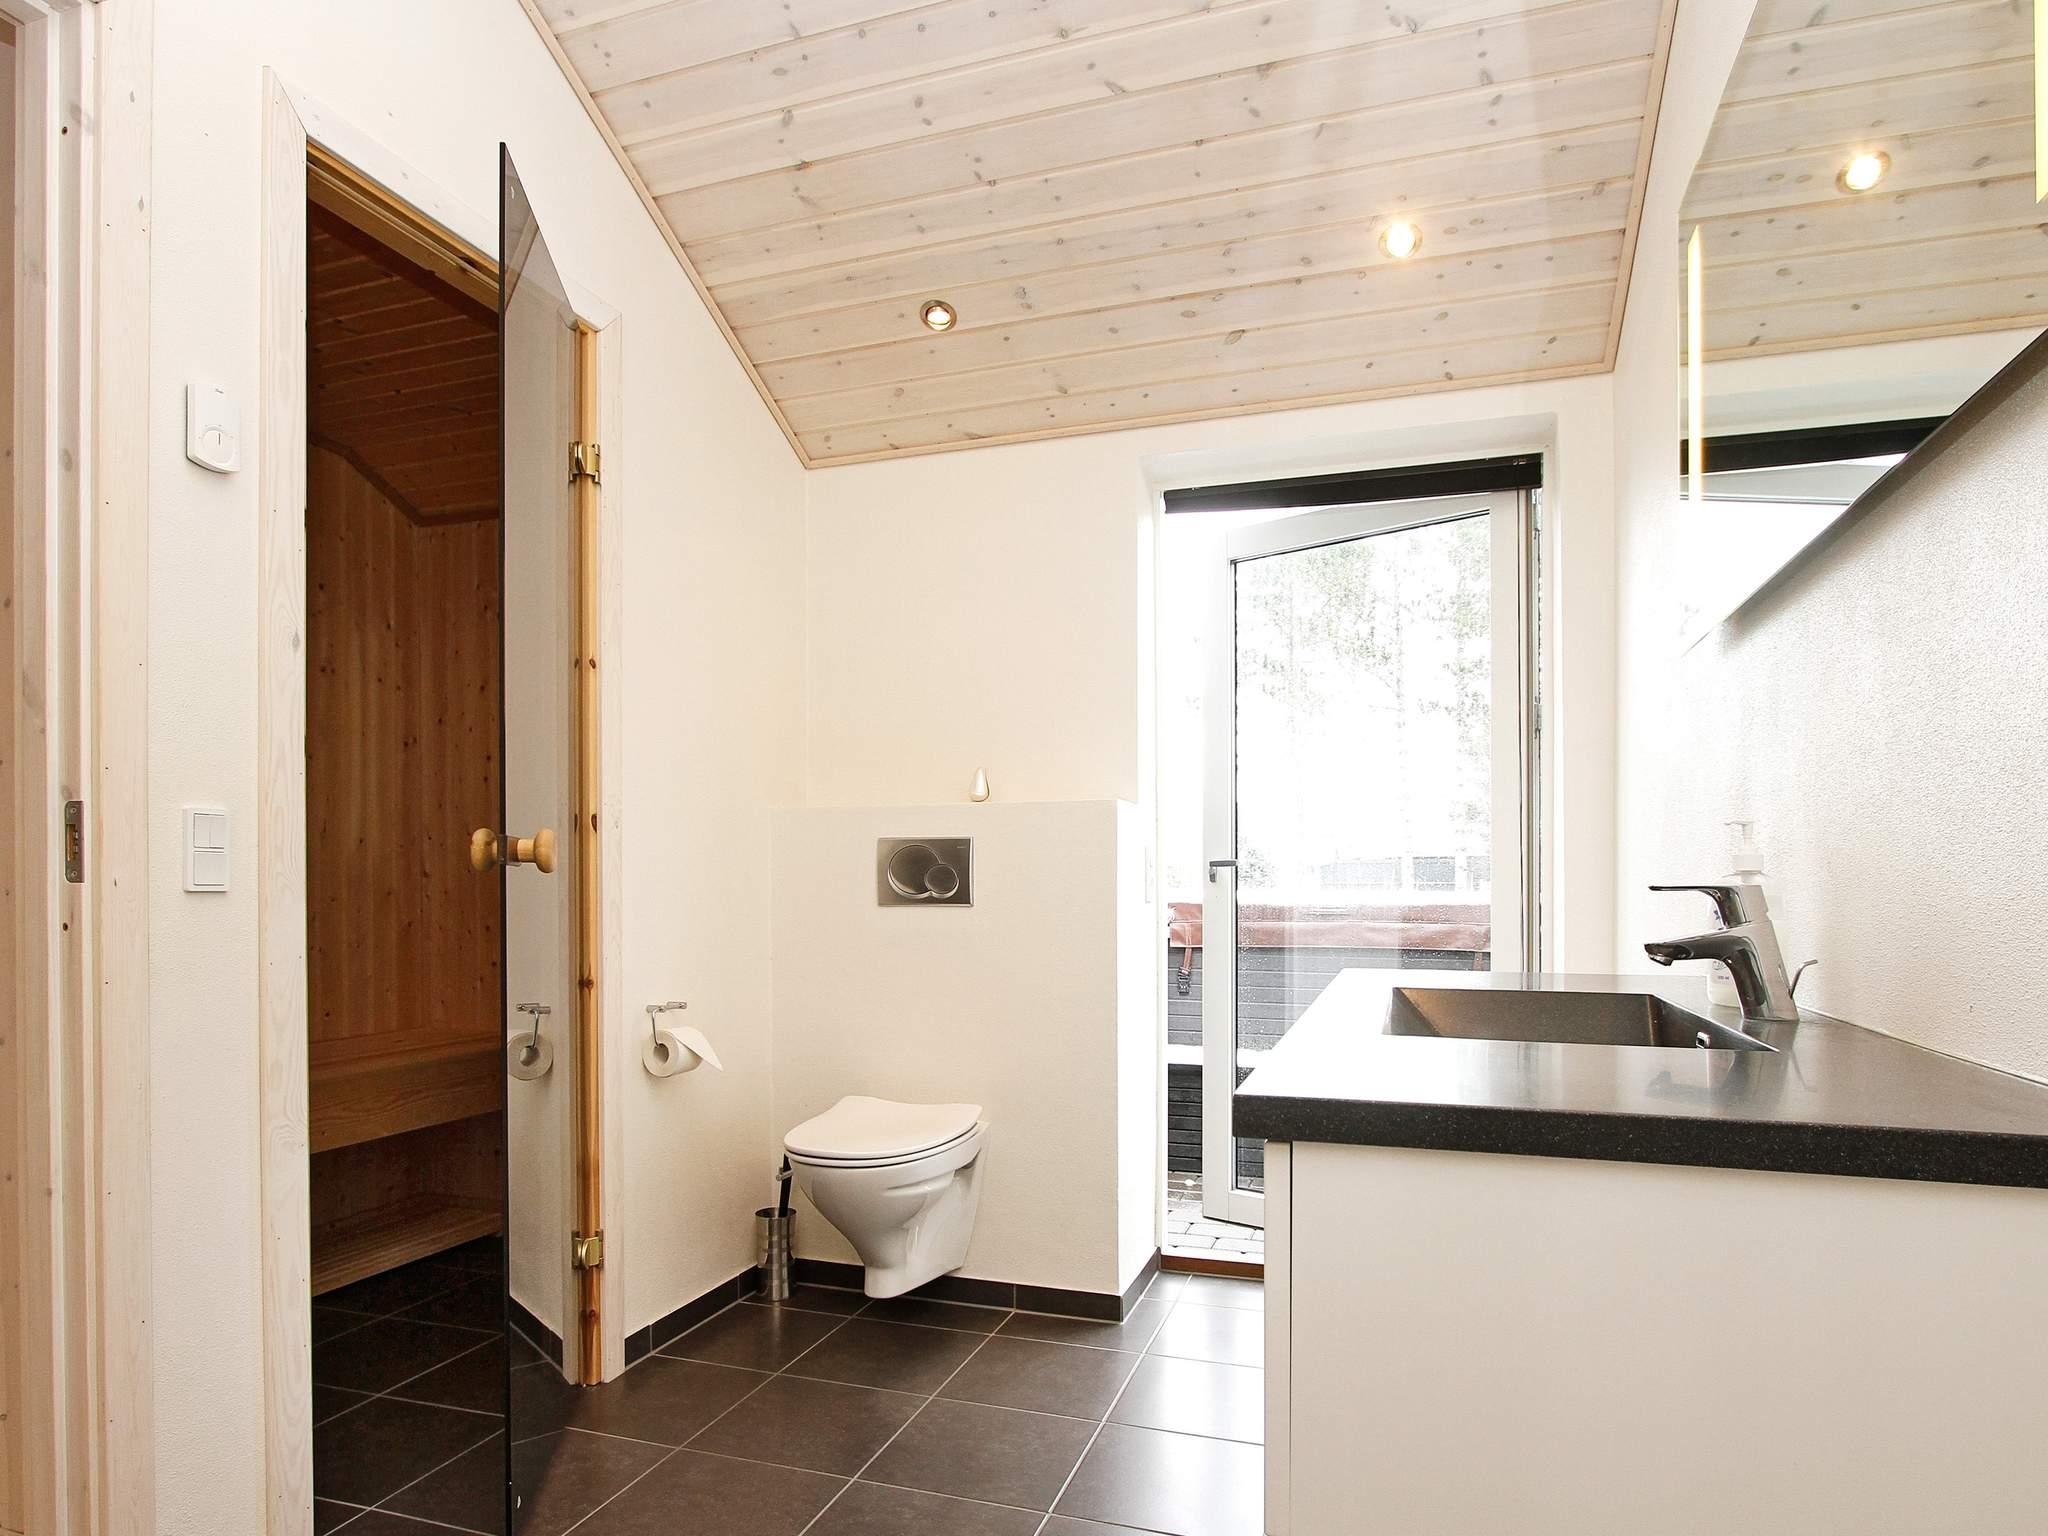 Ferienhaus Rømø/Havneby (437893), Rømø, , Südwestjütland, Dänemark, Bild 25